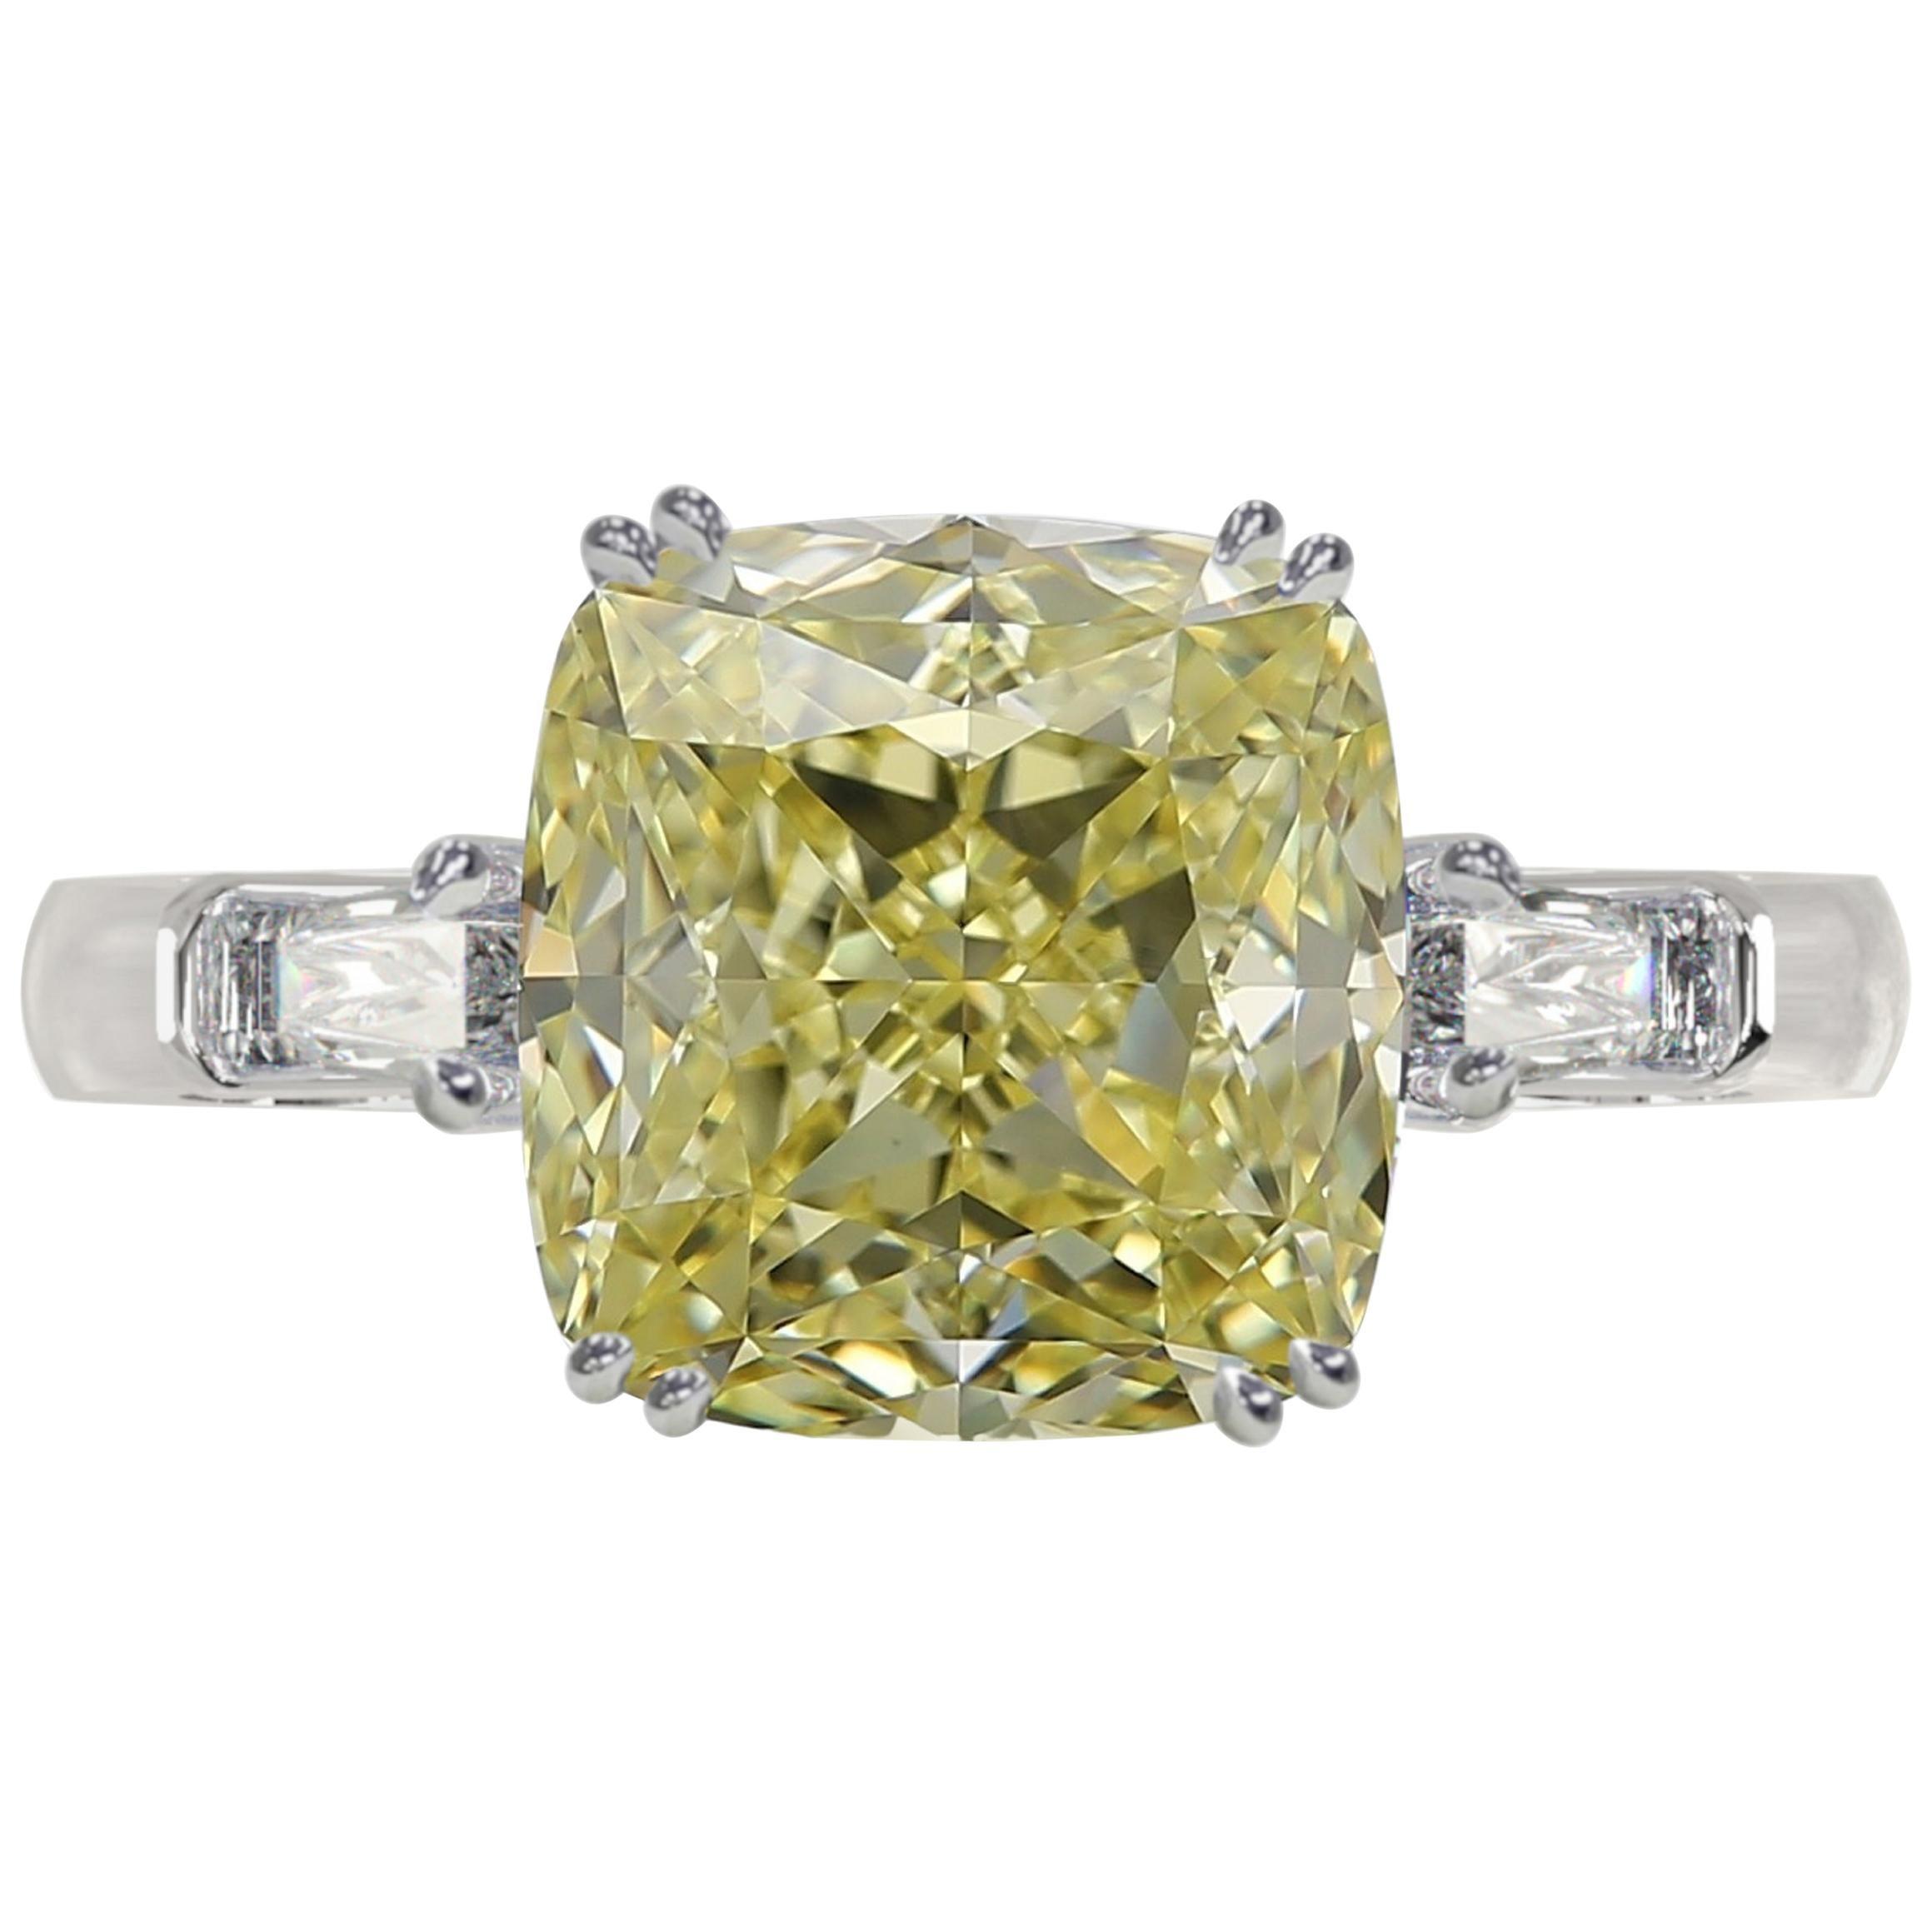 Internally Flawless GIA Certified 3.90 Carat Fancy Intense Yellow Diamond Ring